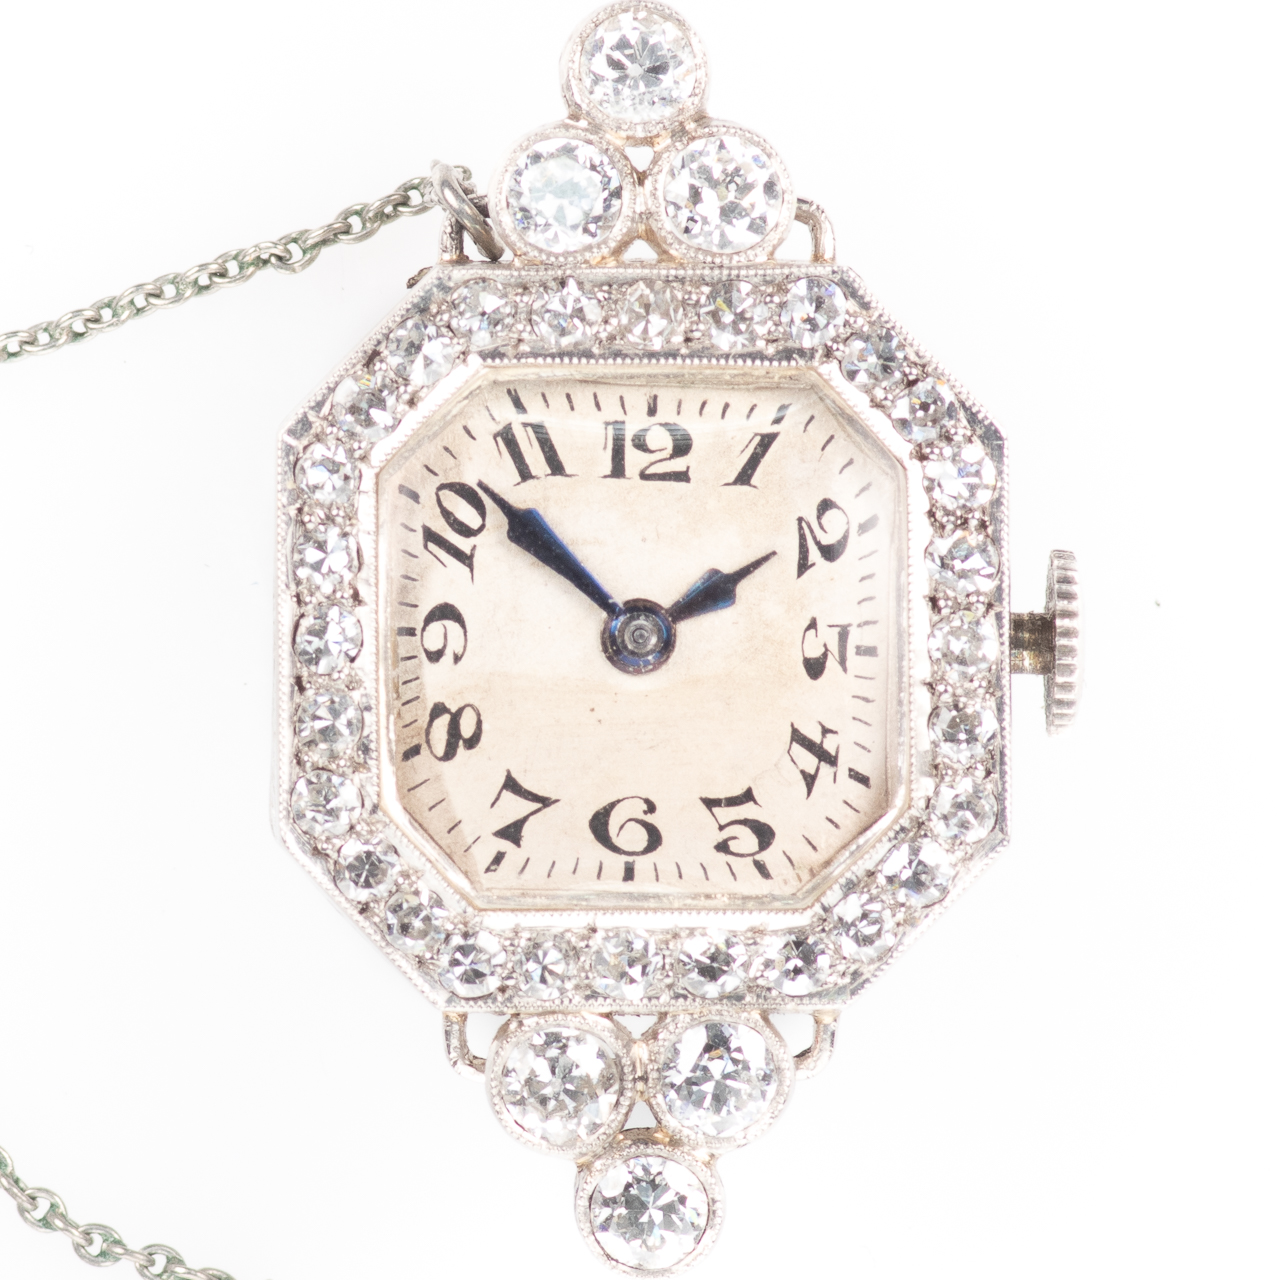 Platinum Art Deco 0.90ct Diamond Watch Brooch